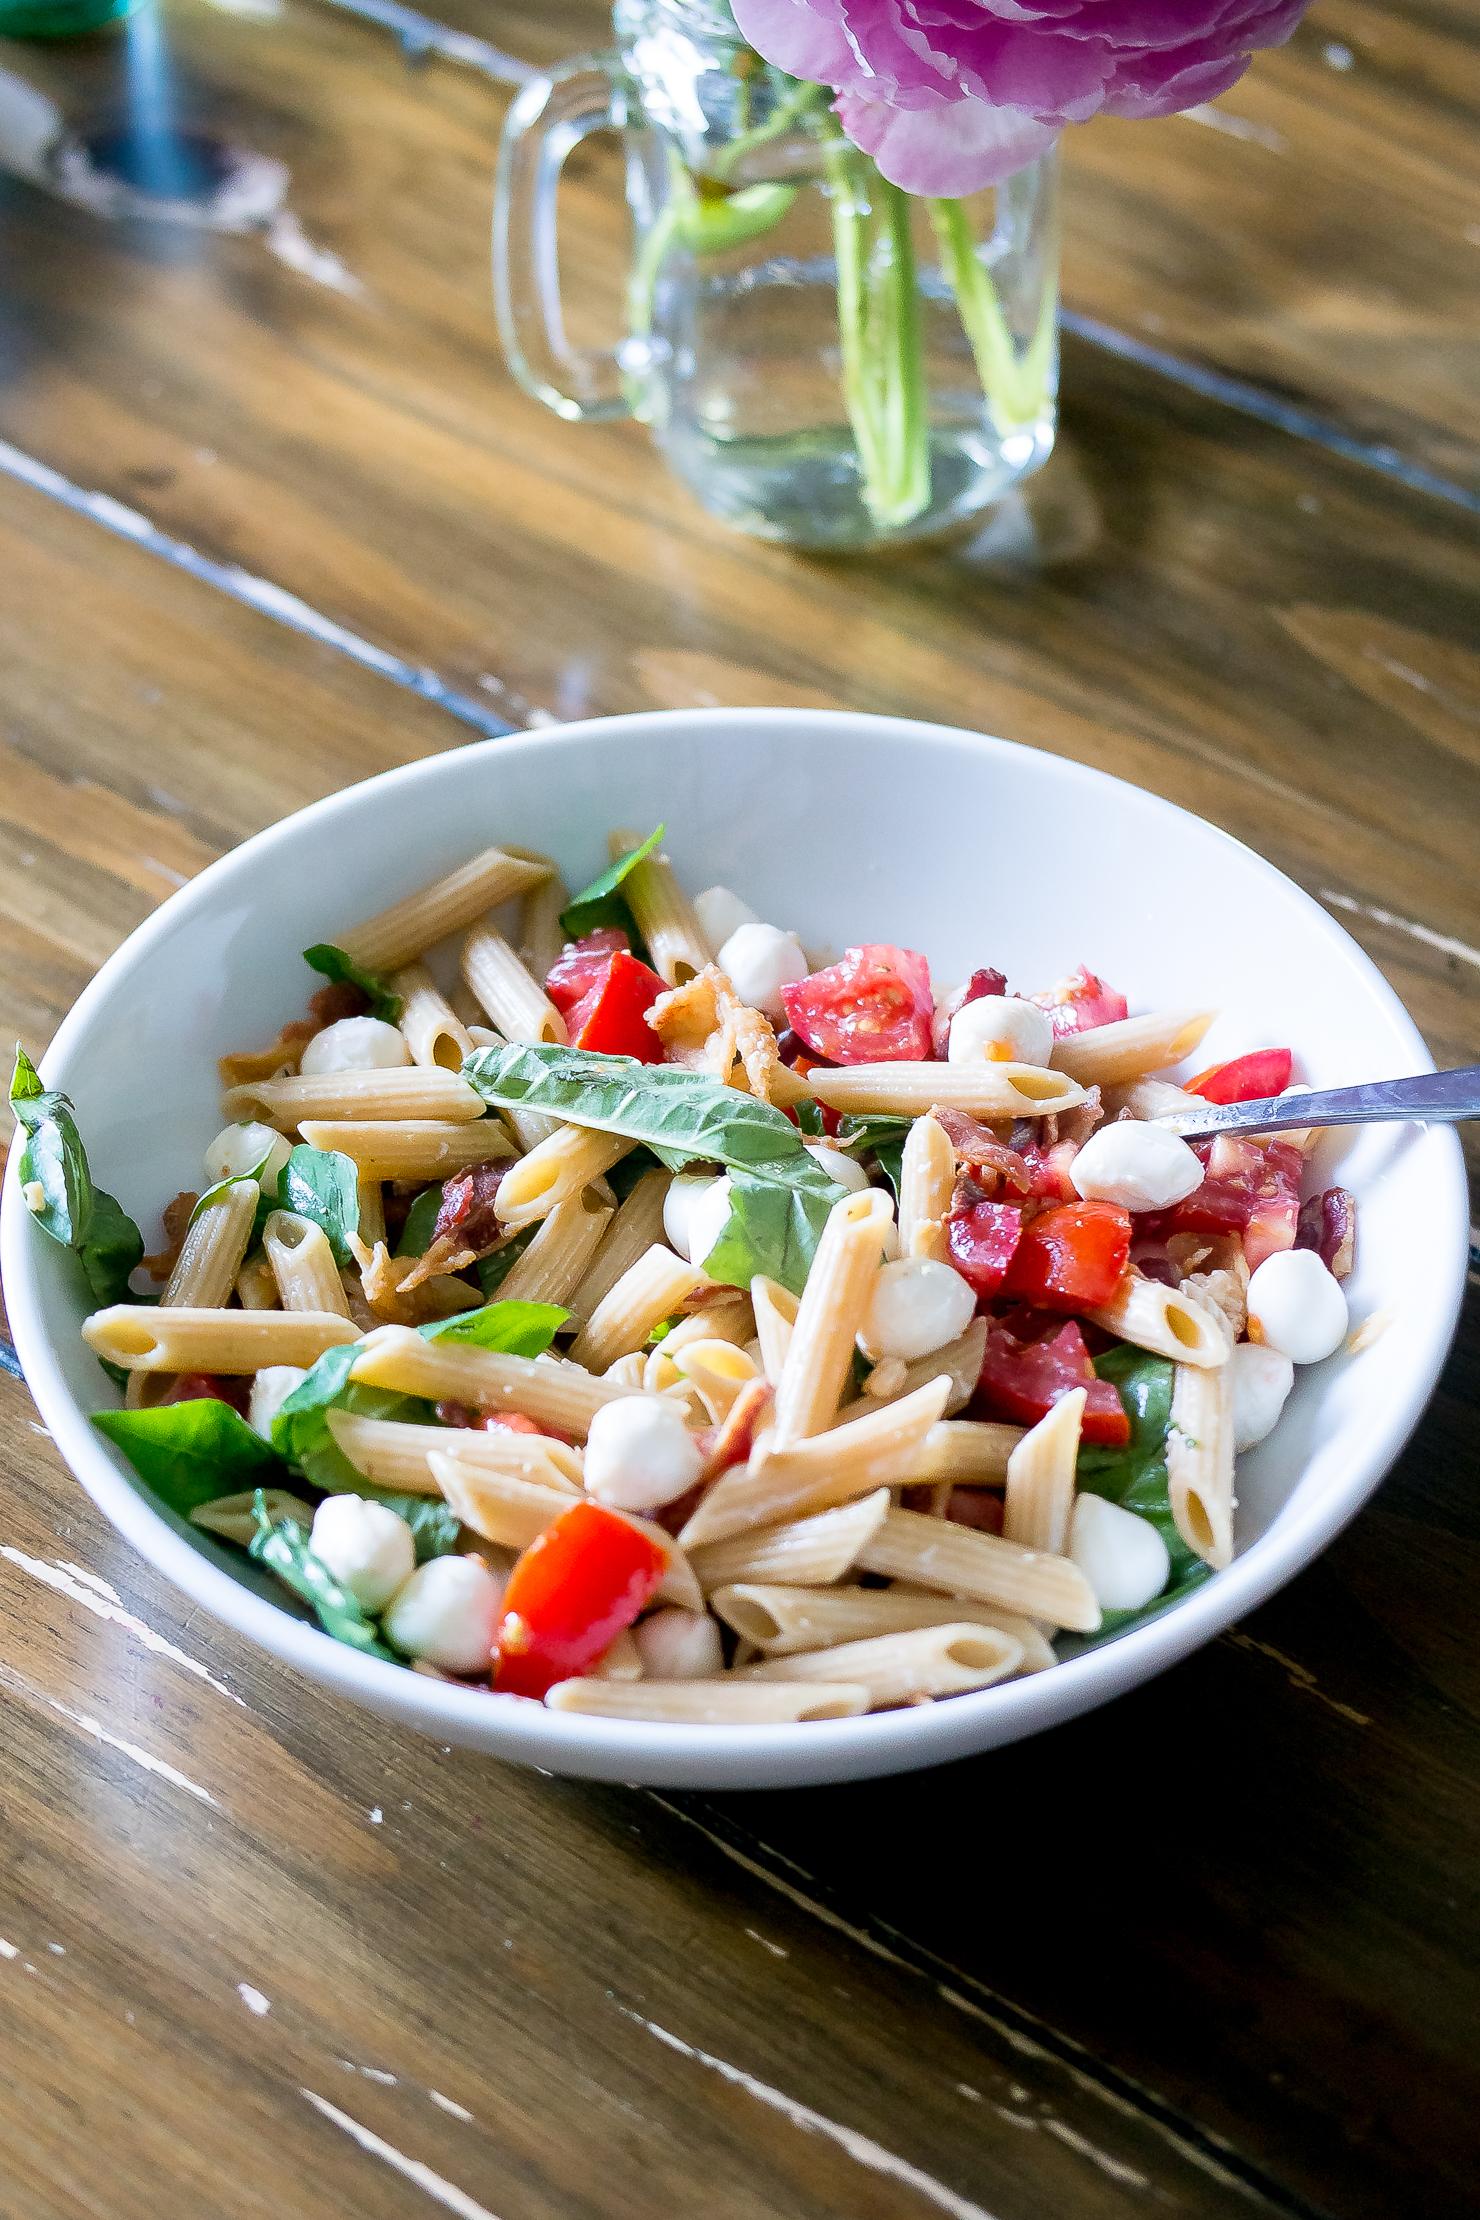 tomato-basil-bacon-mozzarella-summer-pasta-salad-with-garlicy-dressing